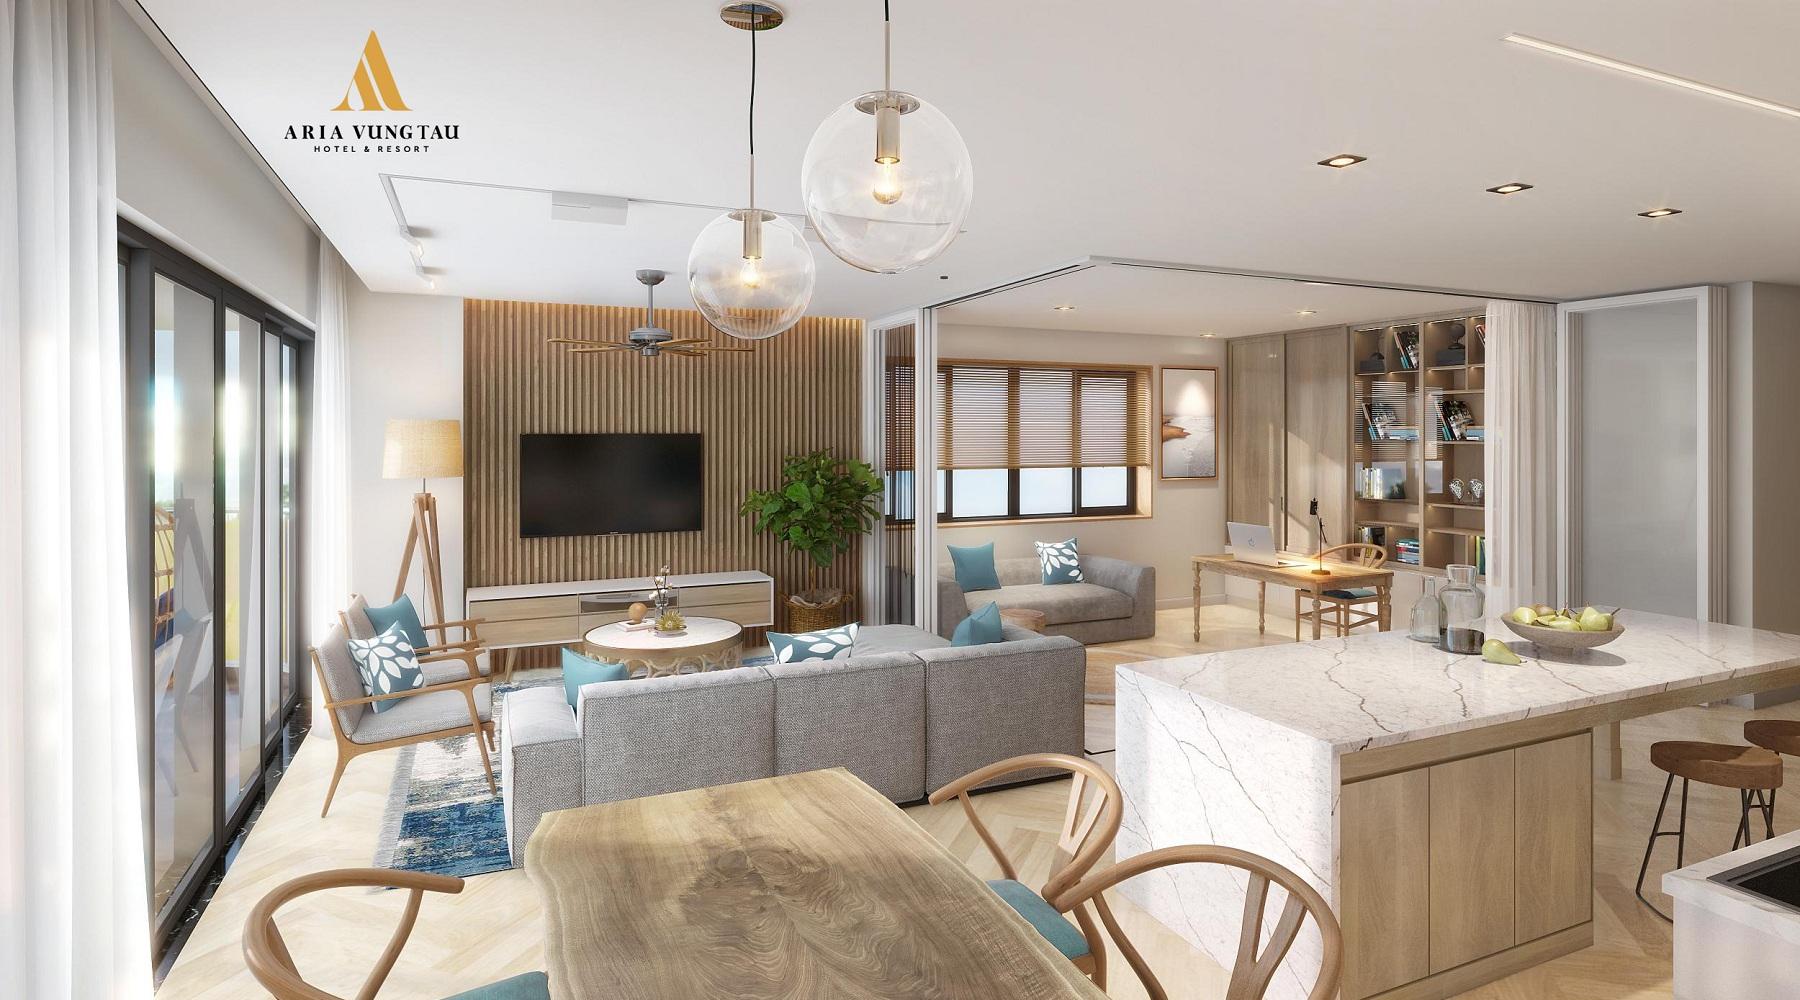 https://charmington.org/public/upload/aria-vung-tau-hotel-resort-living-room-2-1576246341.jpg